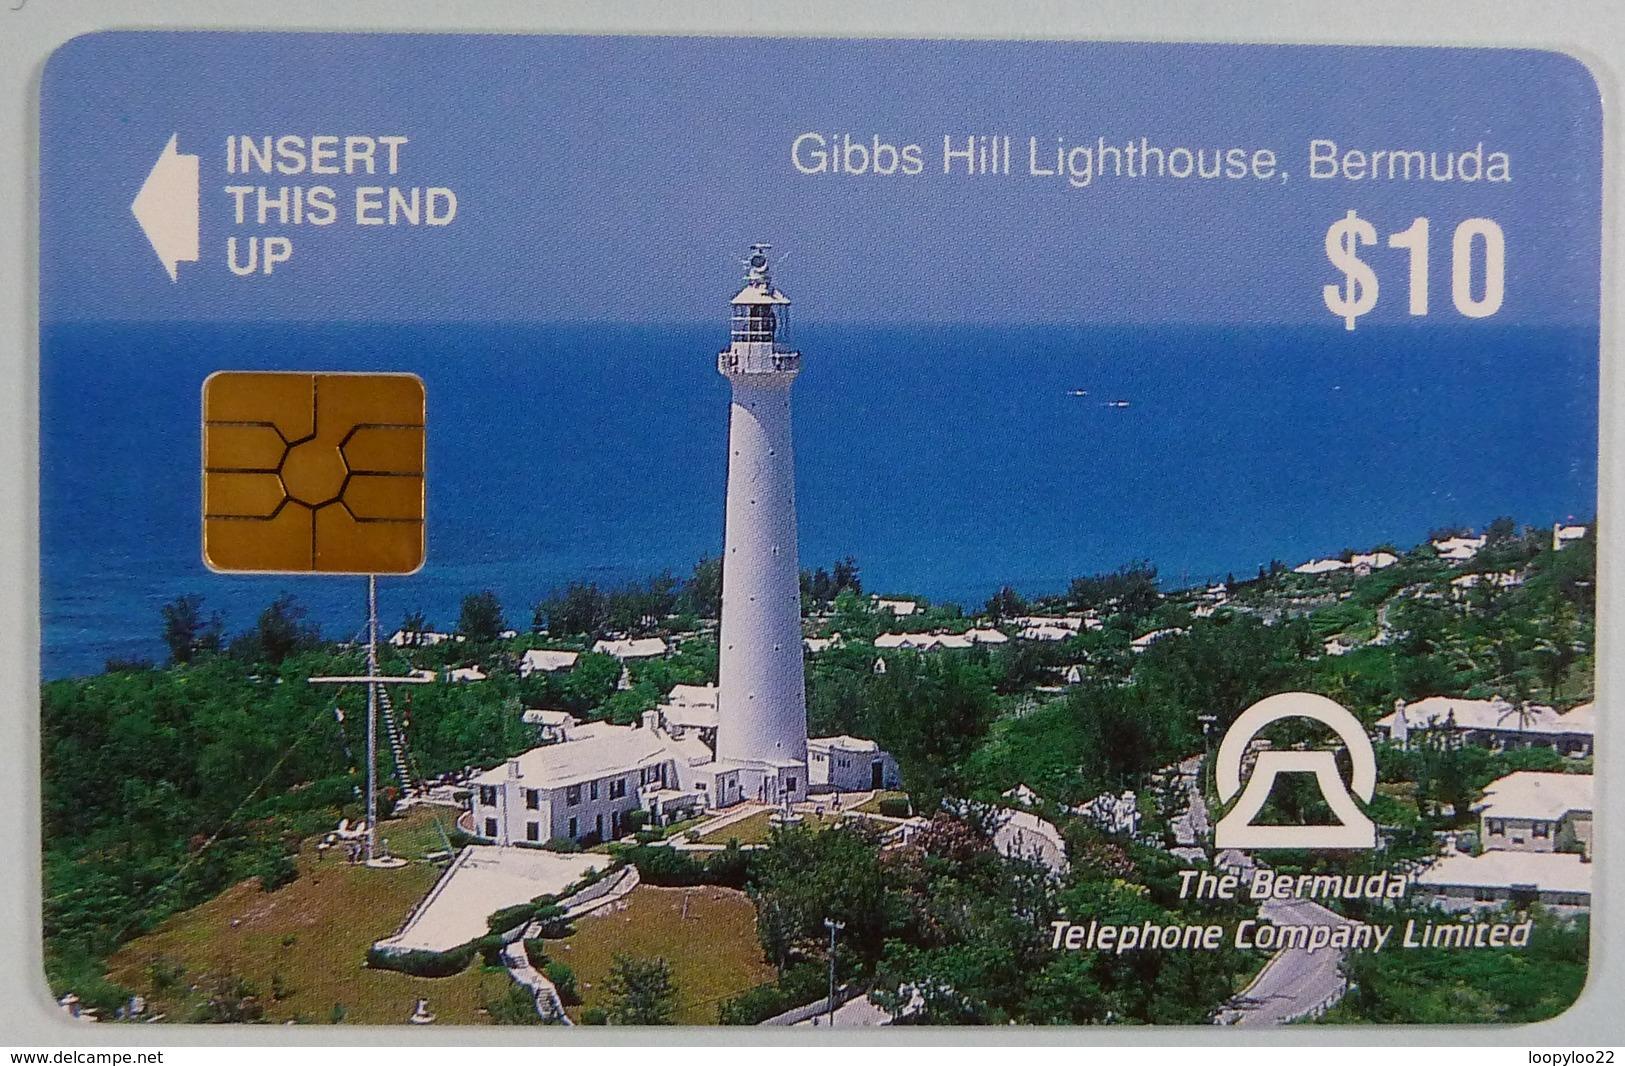 BERMUDA - Chip - Gibbs Hill Lighthouse - $10 - Mint - Bermuda